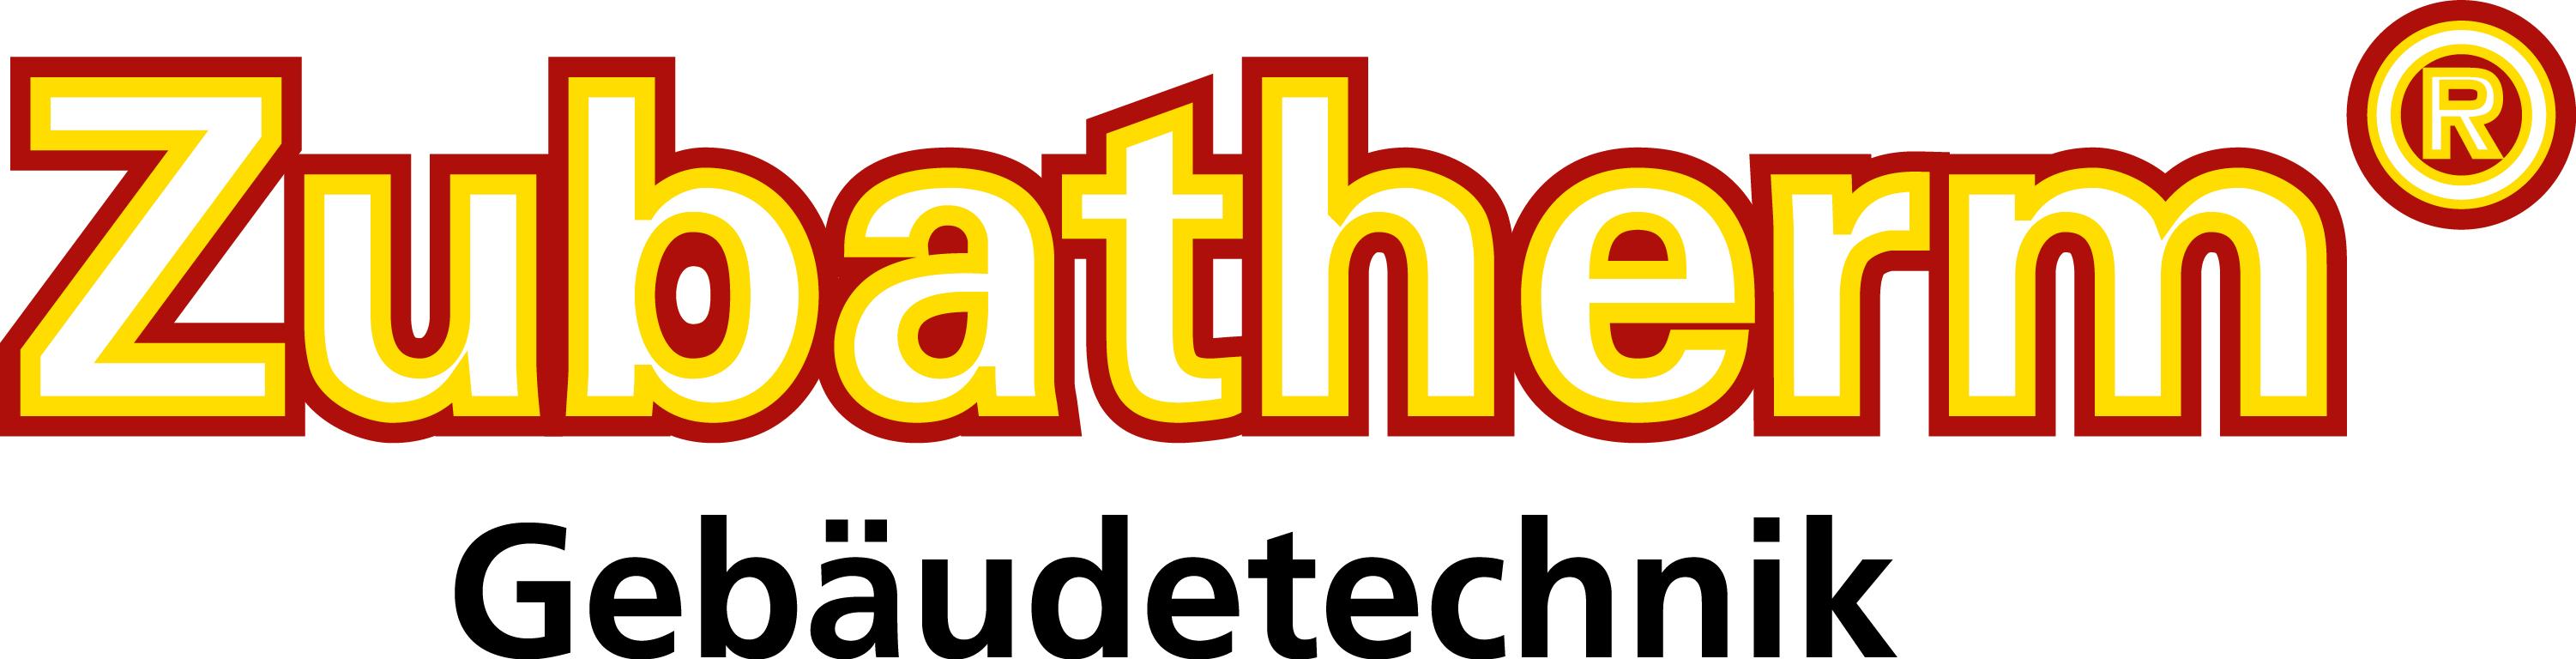 Zubatherm GmbH